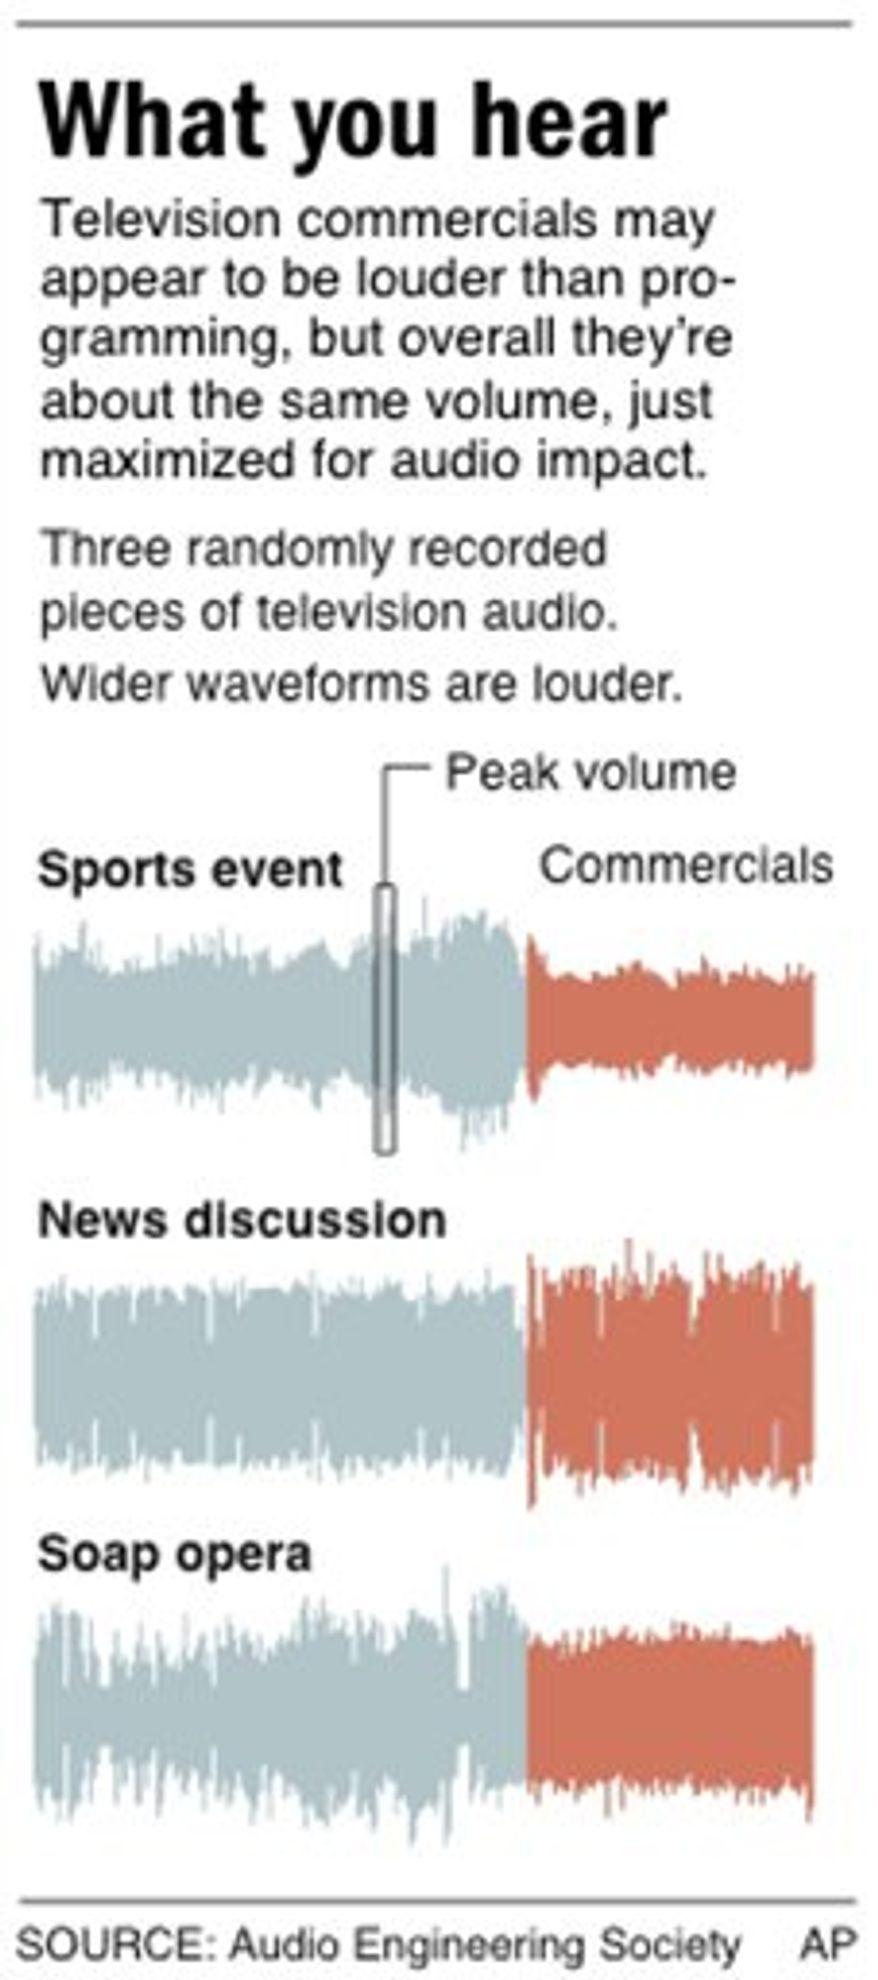 Graphic compares waveforms of randomly recorded pieces of television audio